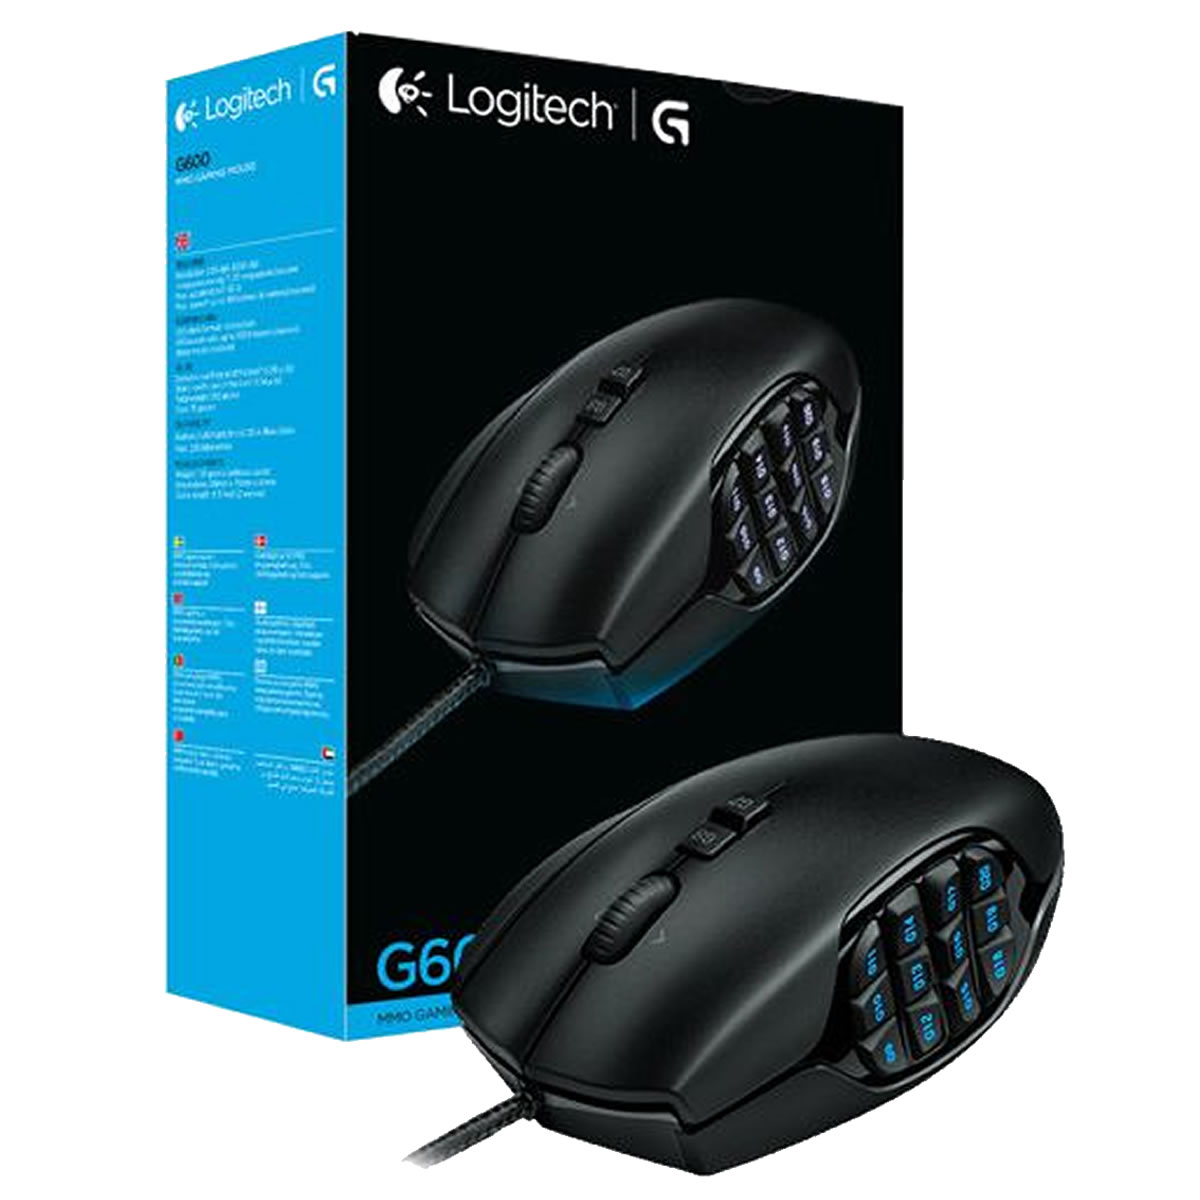 MOUSE LOGITECH G600 20 BOTONES PROG. 8200DPI